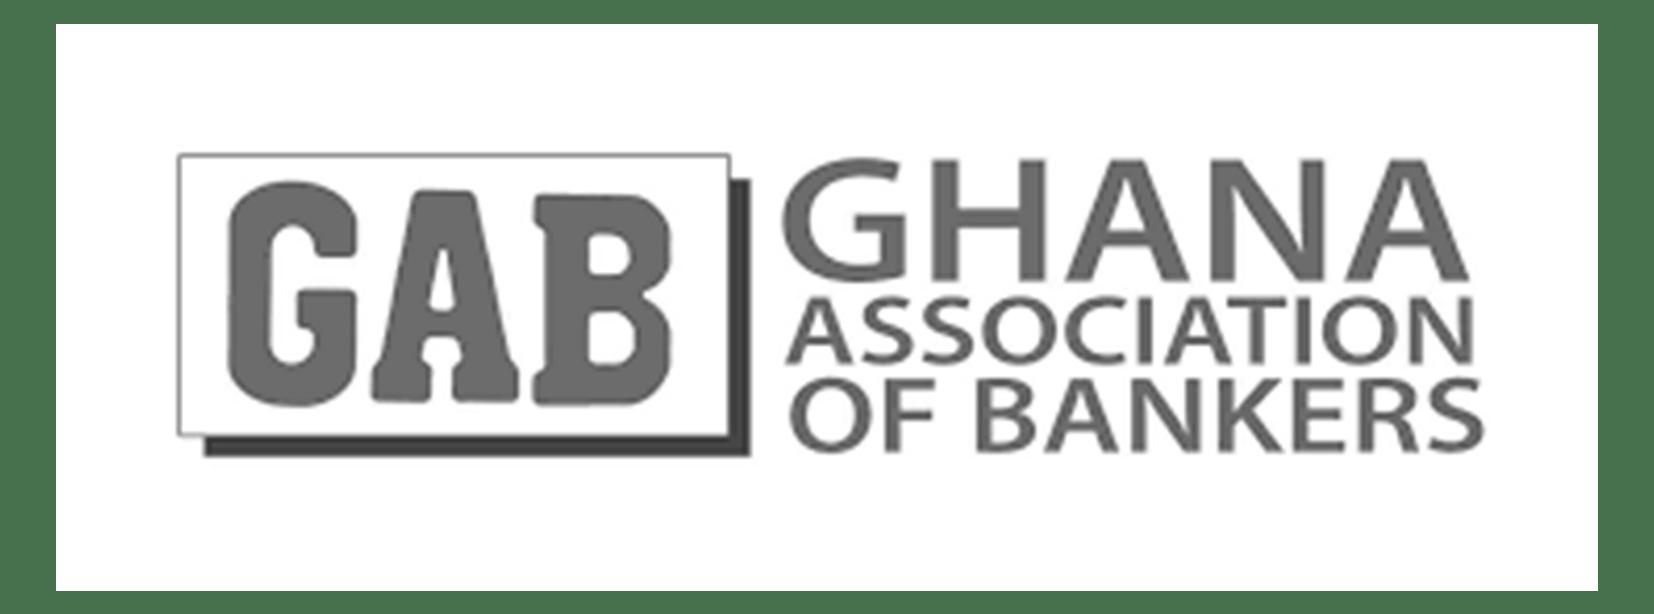 Ghana association of bankers logistic partners